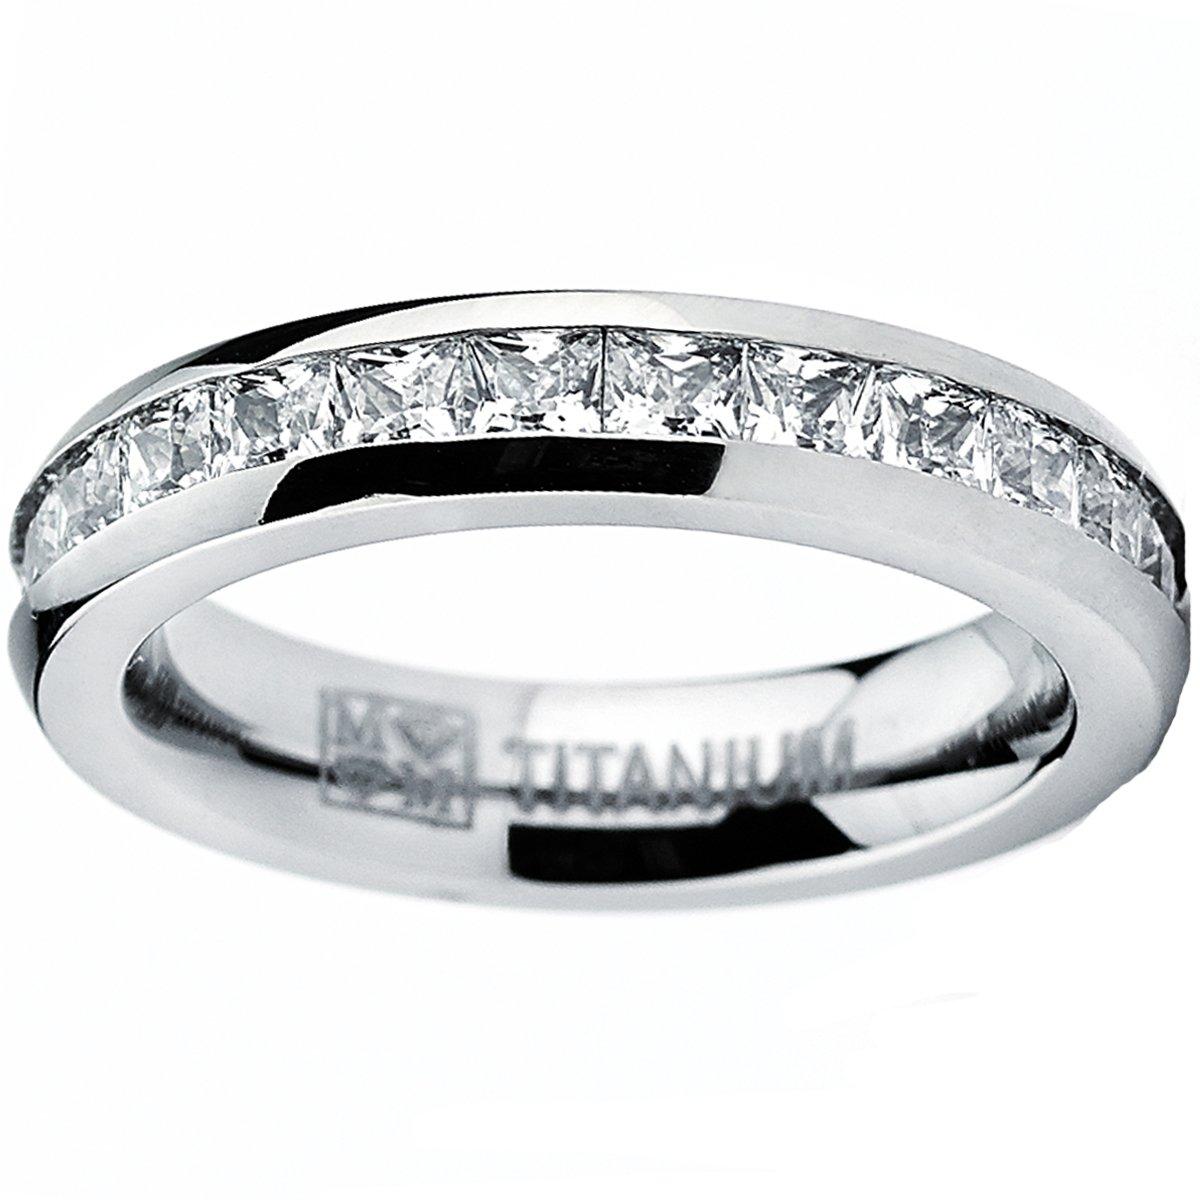 4MM High Polish Princess Cut Ladies Eternity Titanium Ring Wedding Band with CZ Size 8